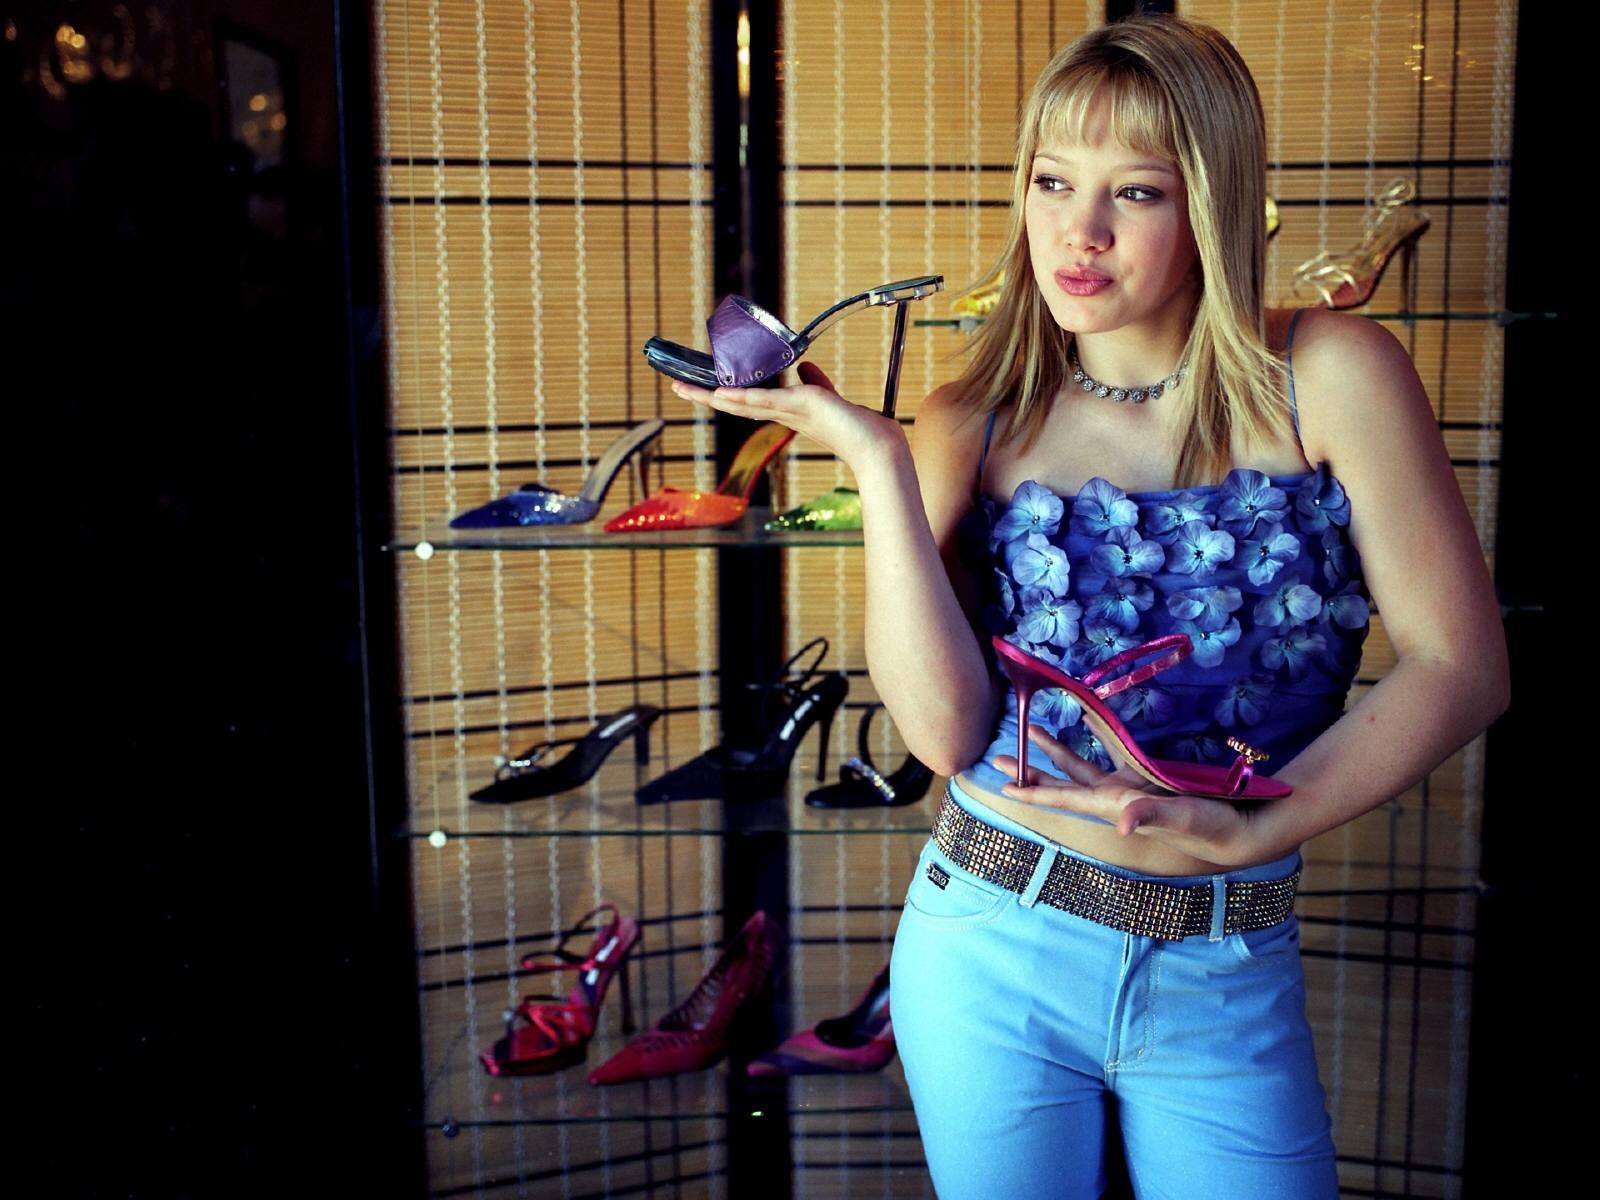 Wallpaper di Hilary Duff - 8